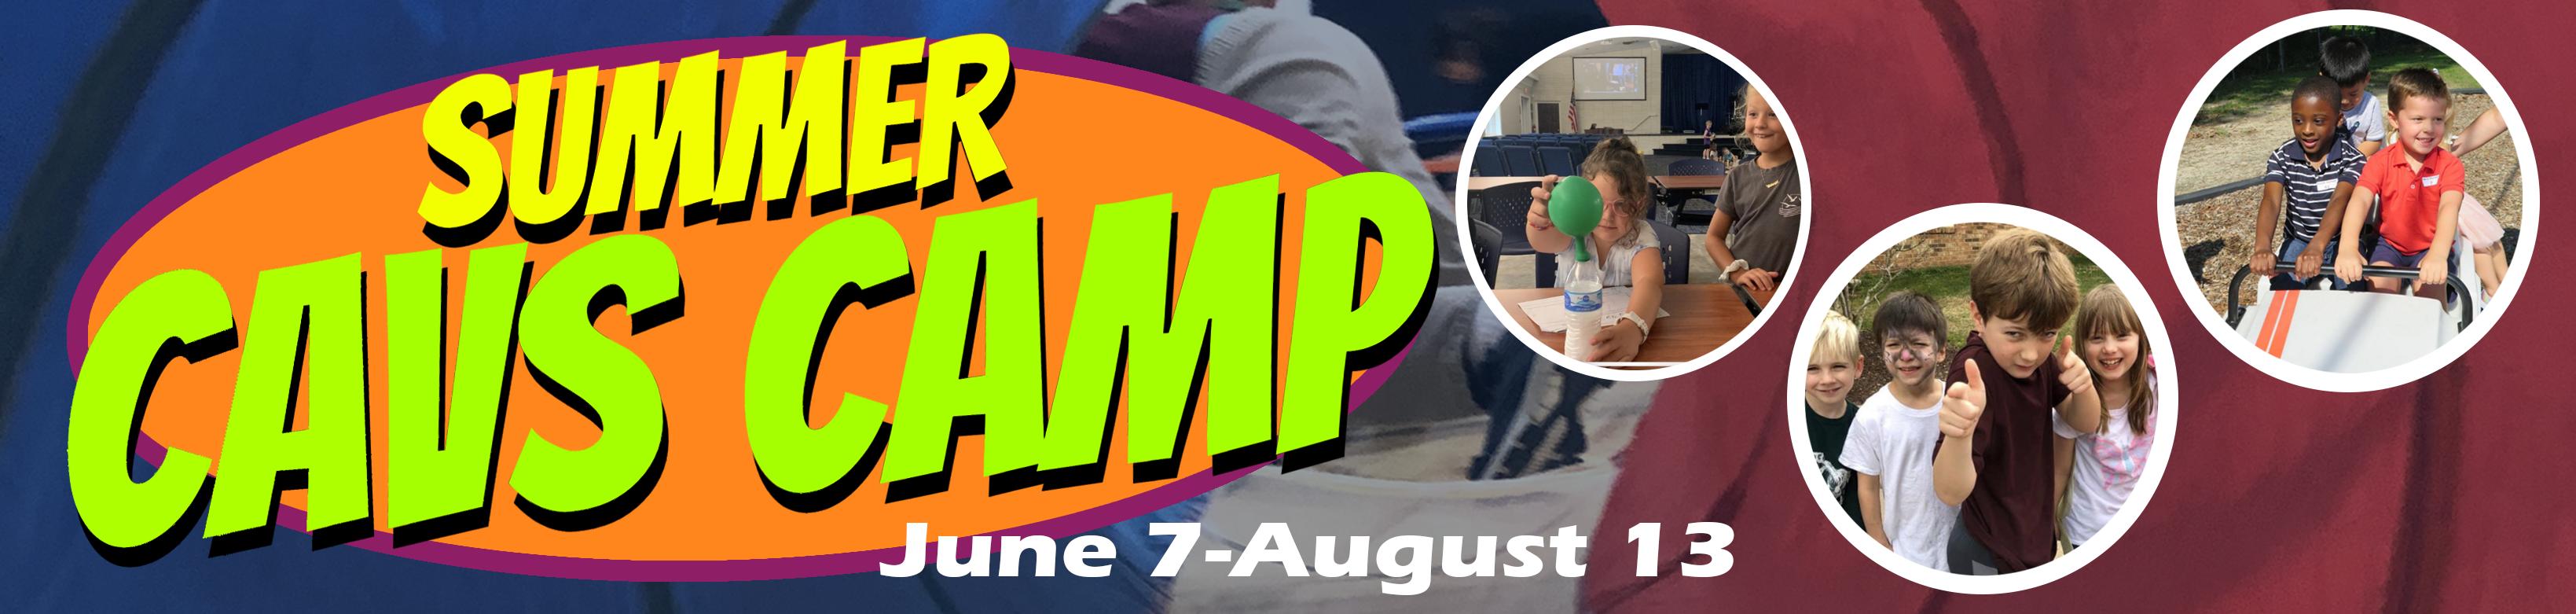 Summer Cavs Camp 2021